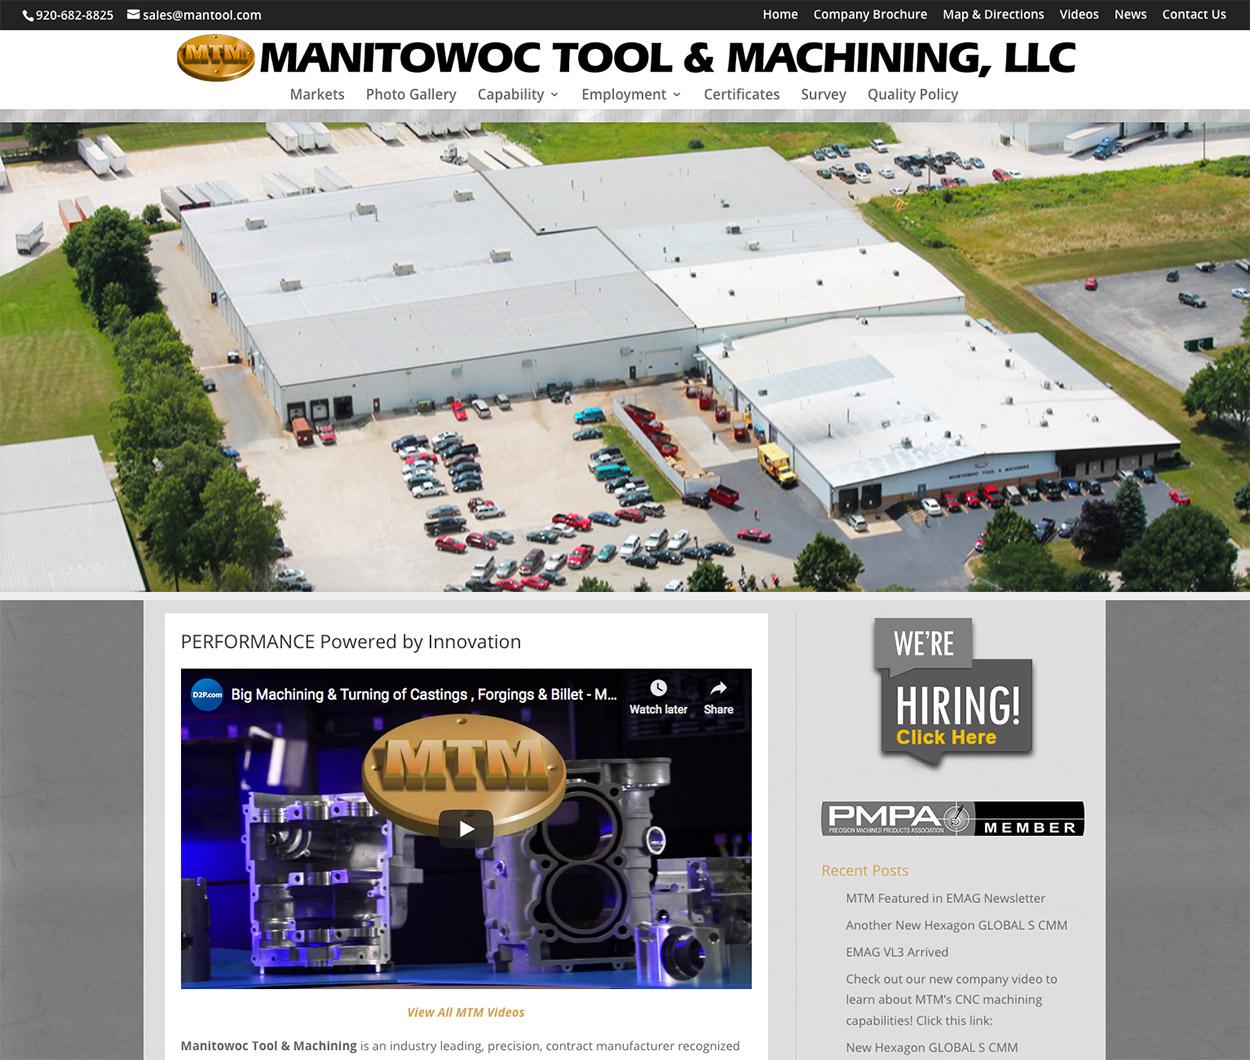 Manitowoc Tool & Machining LLC ~ Manitowoc, Wisconsin